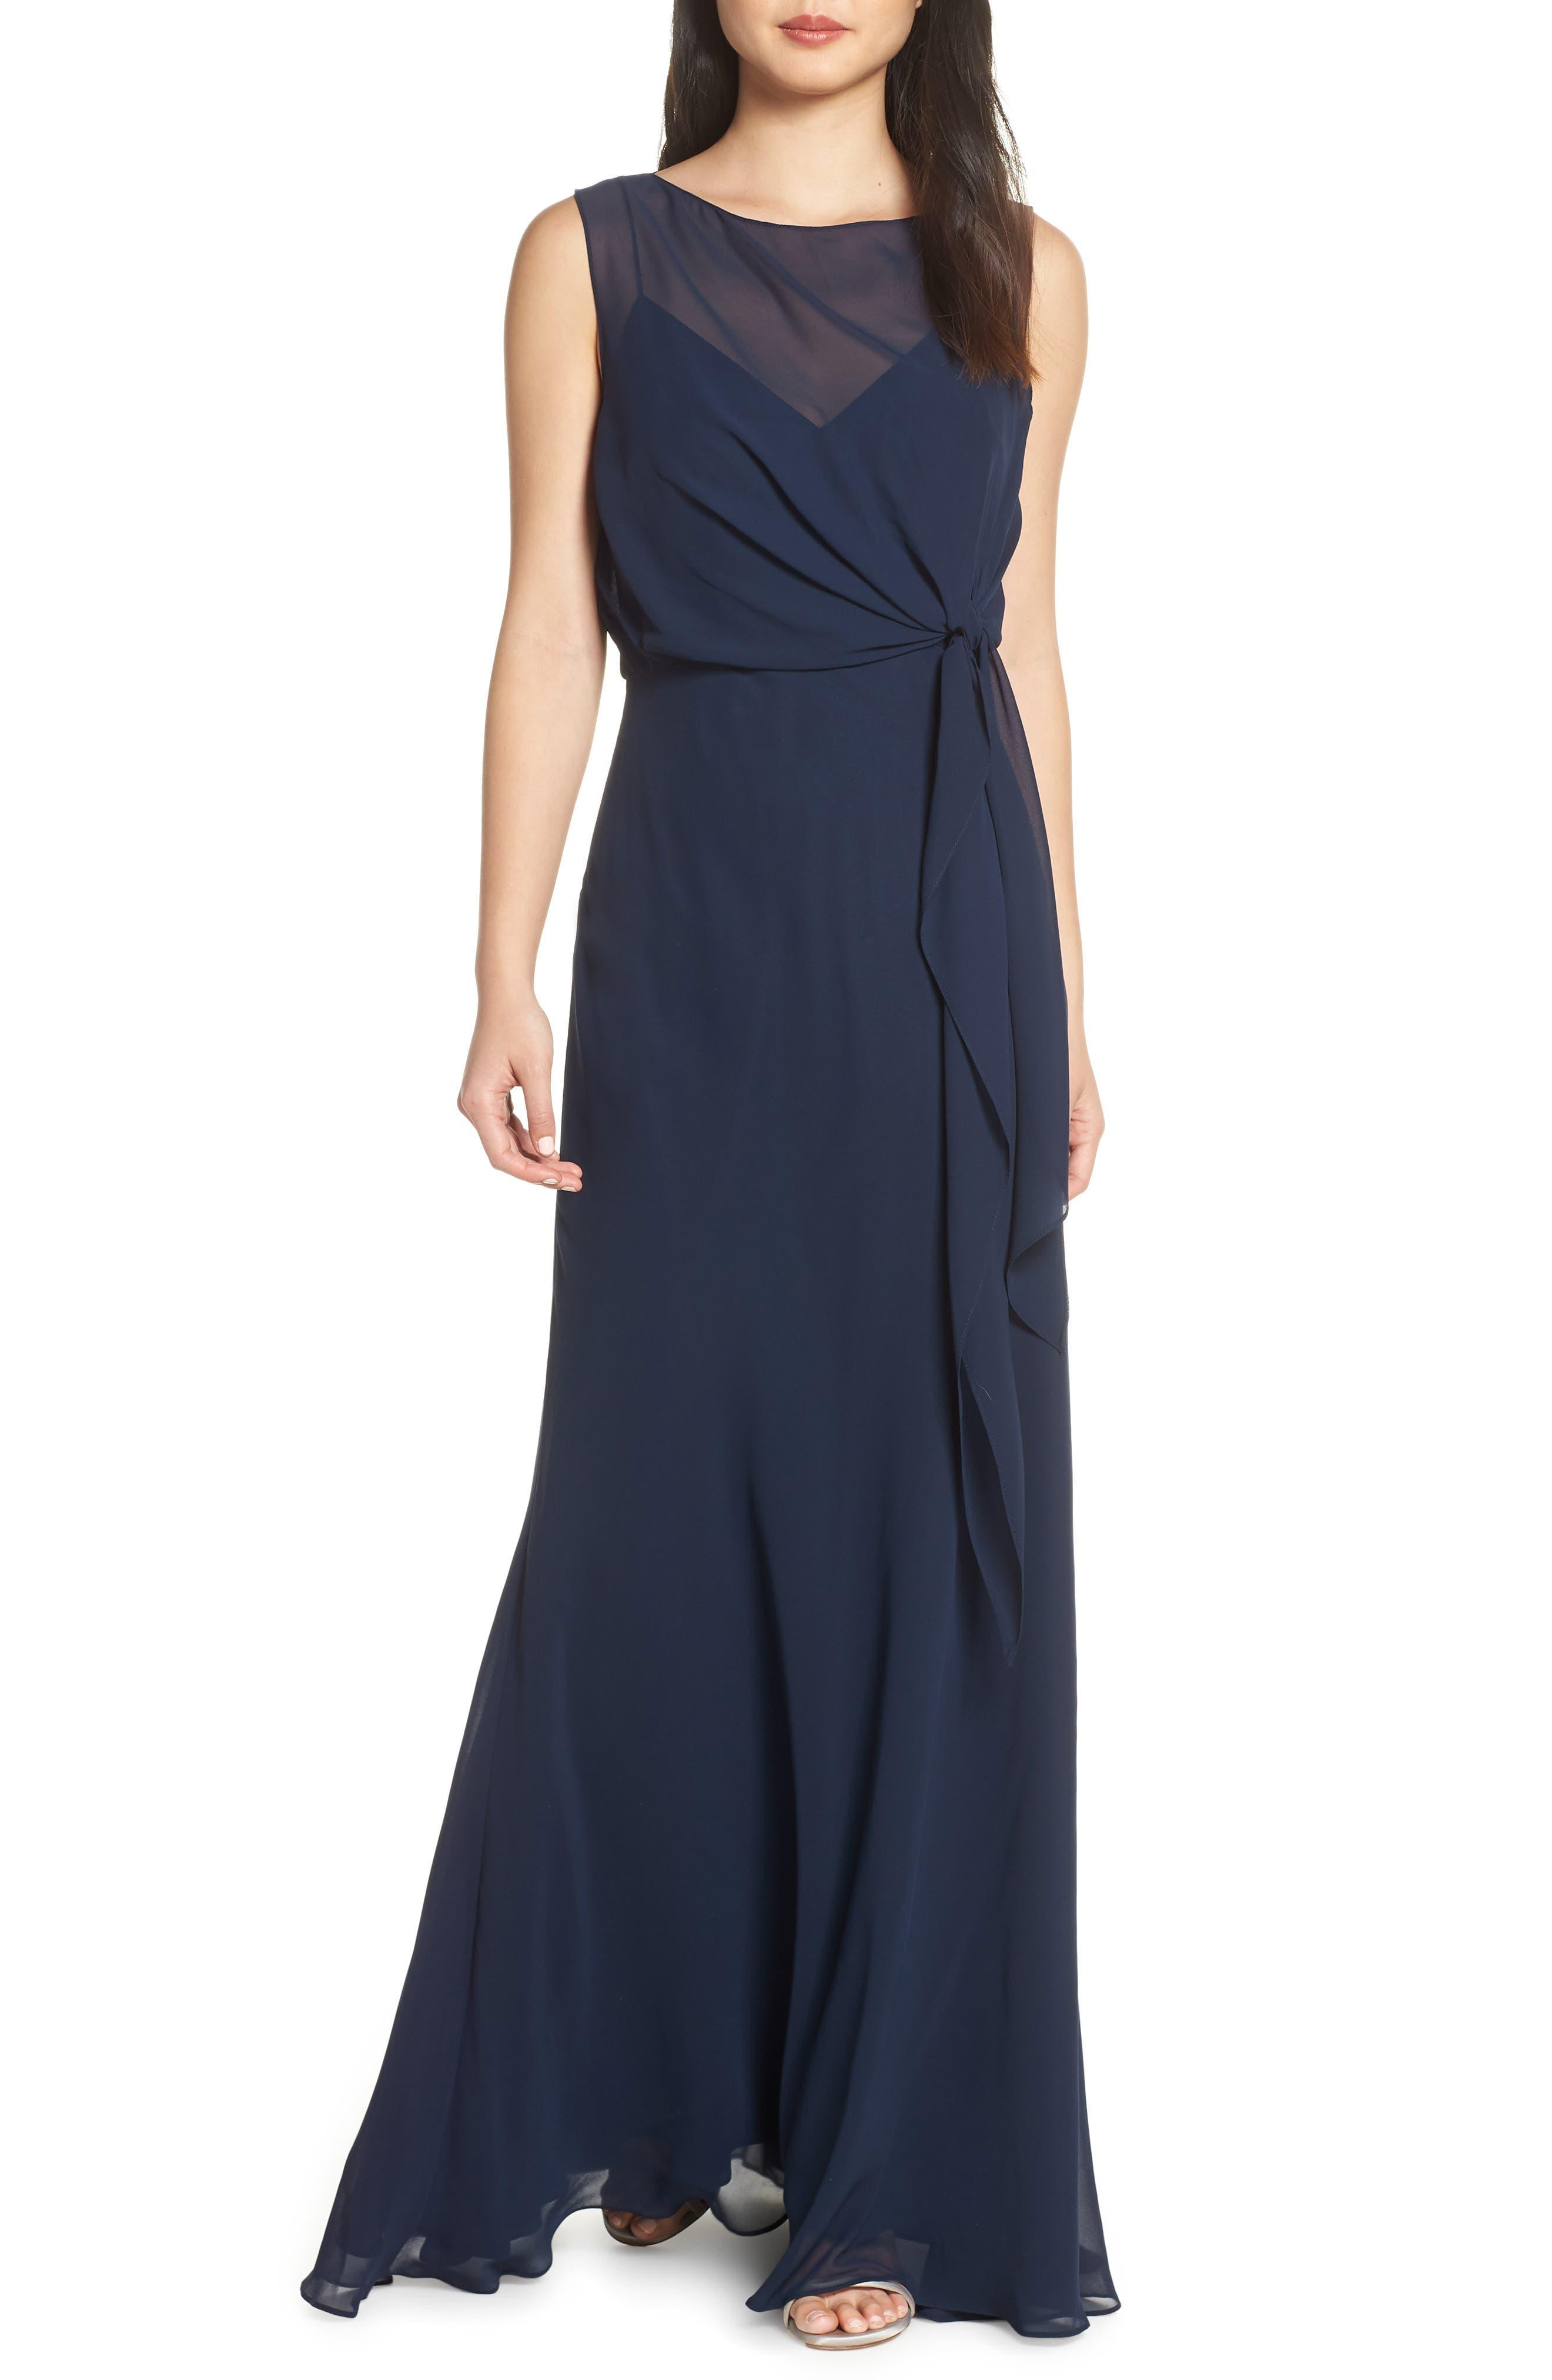 Jenny Yoo Chiffon Overlay Evening Dress, Blue